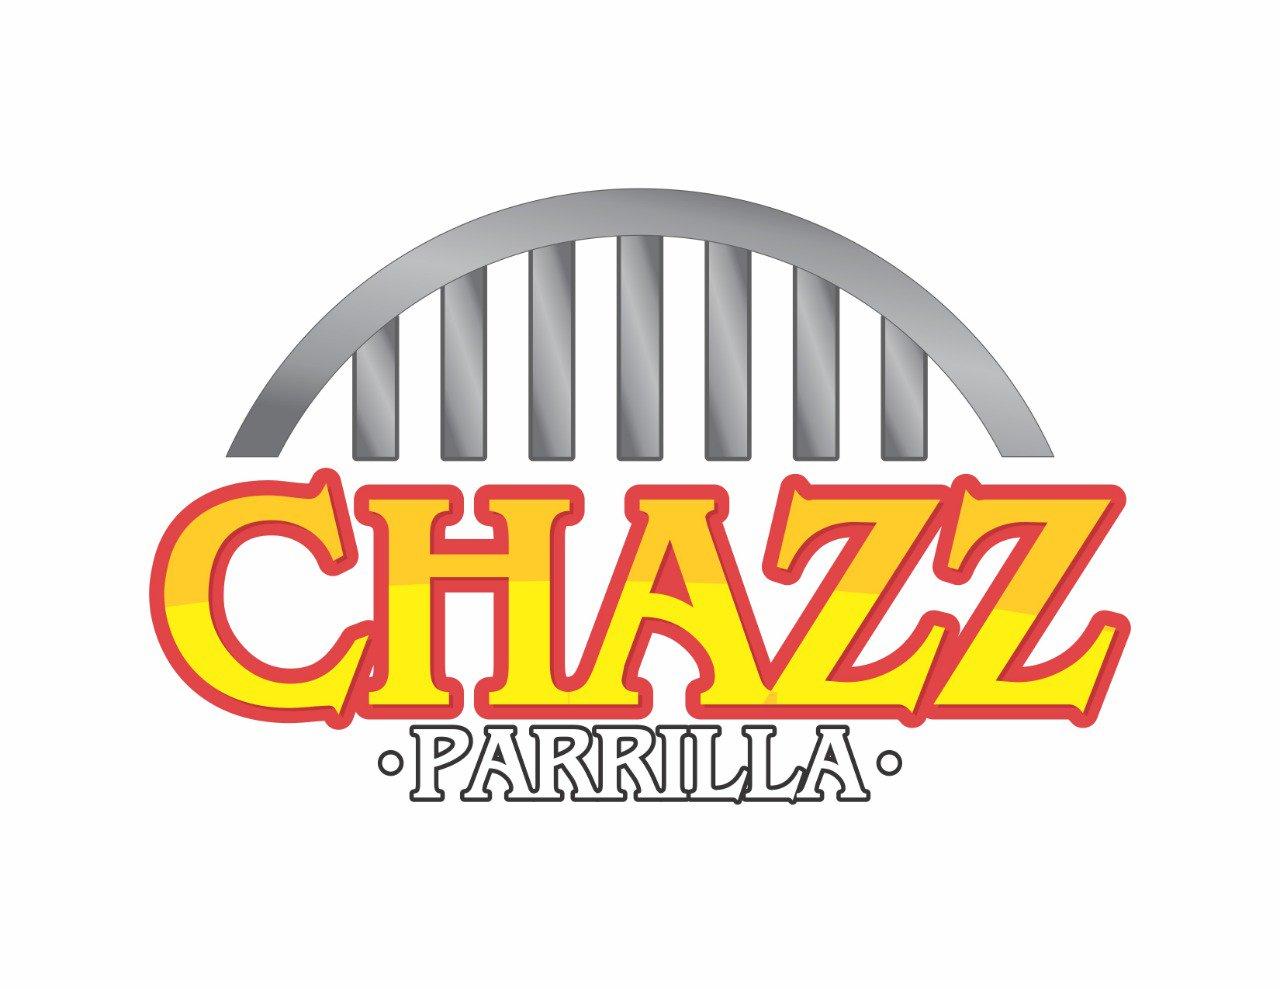 Chazz Parrilla